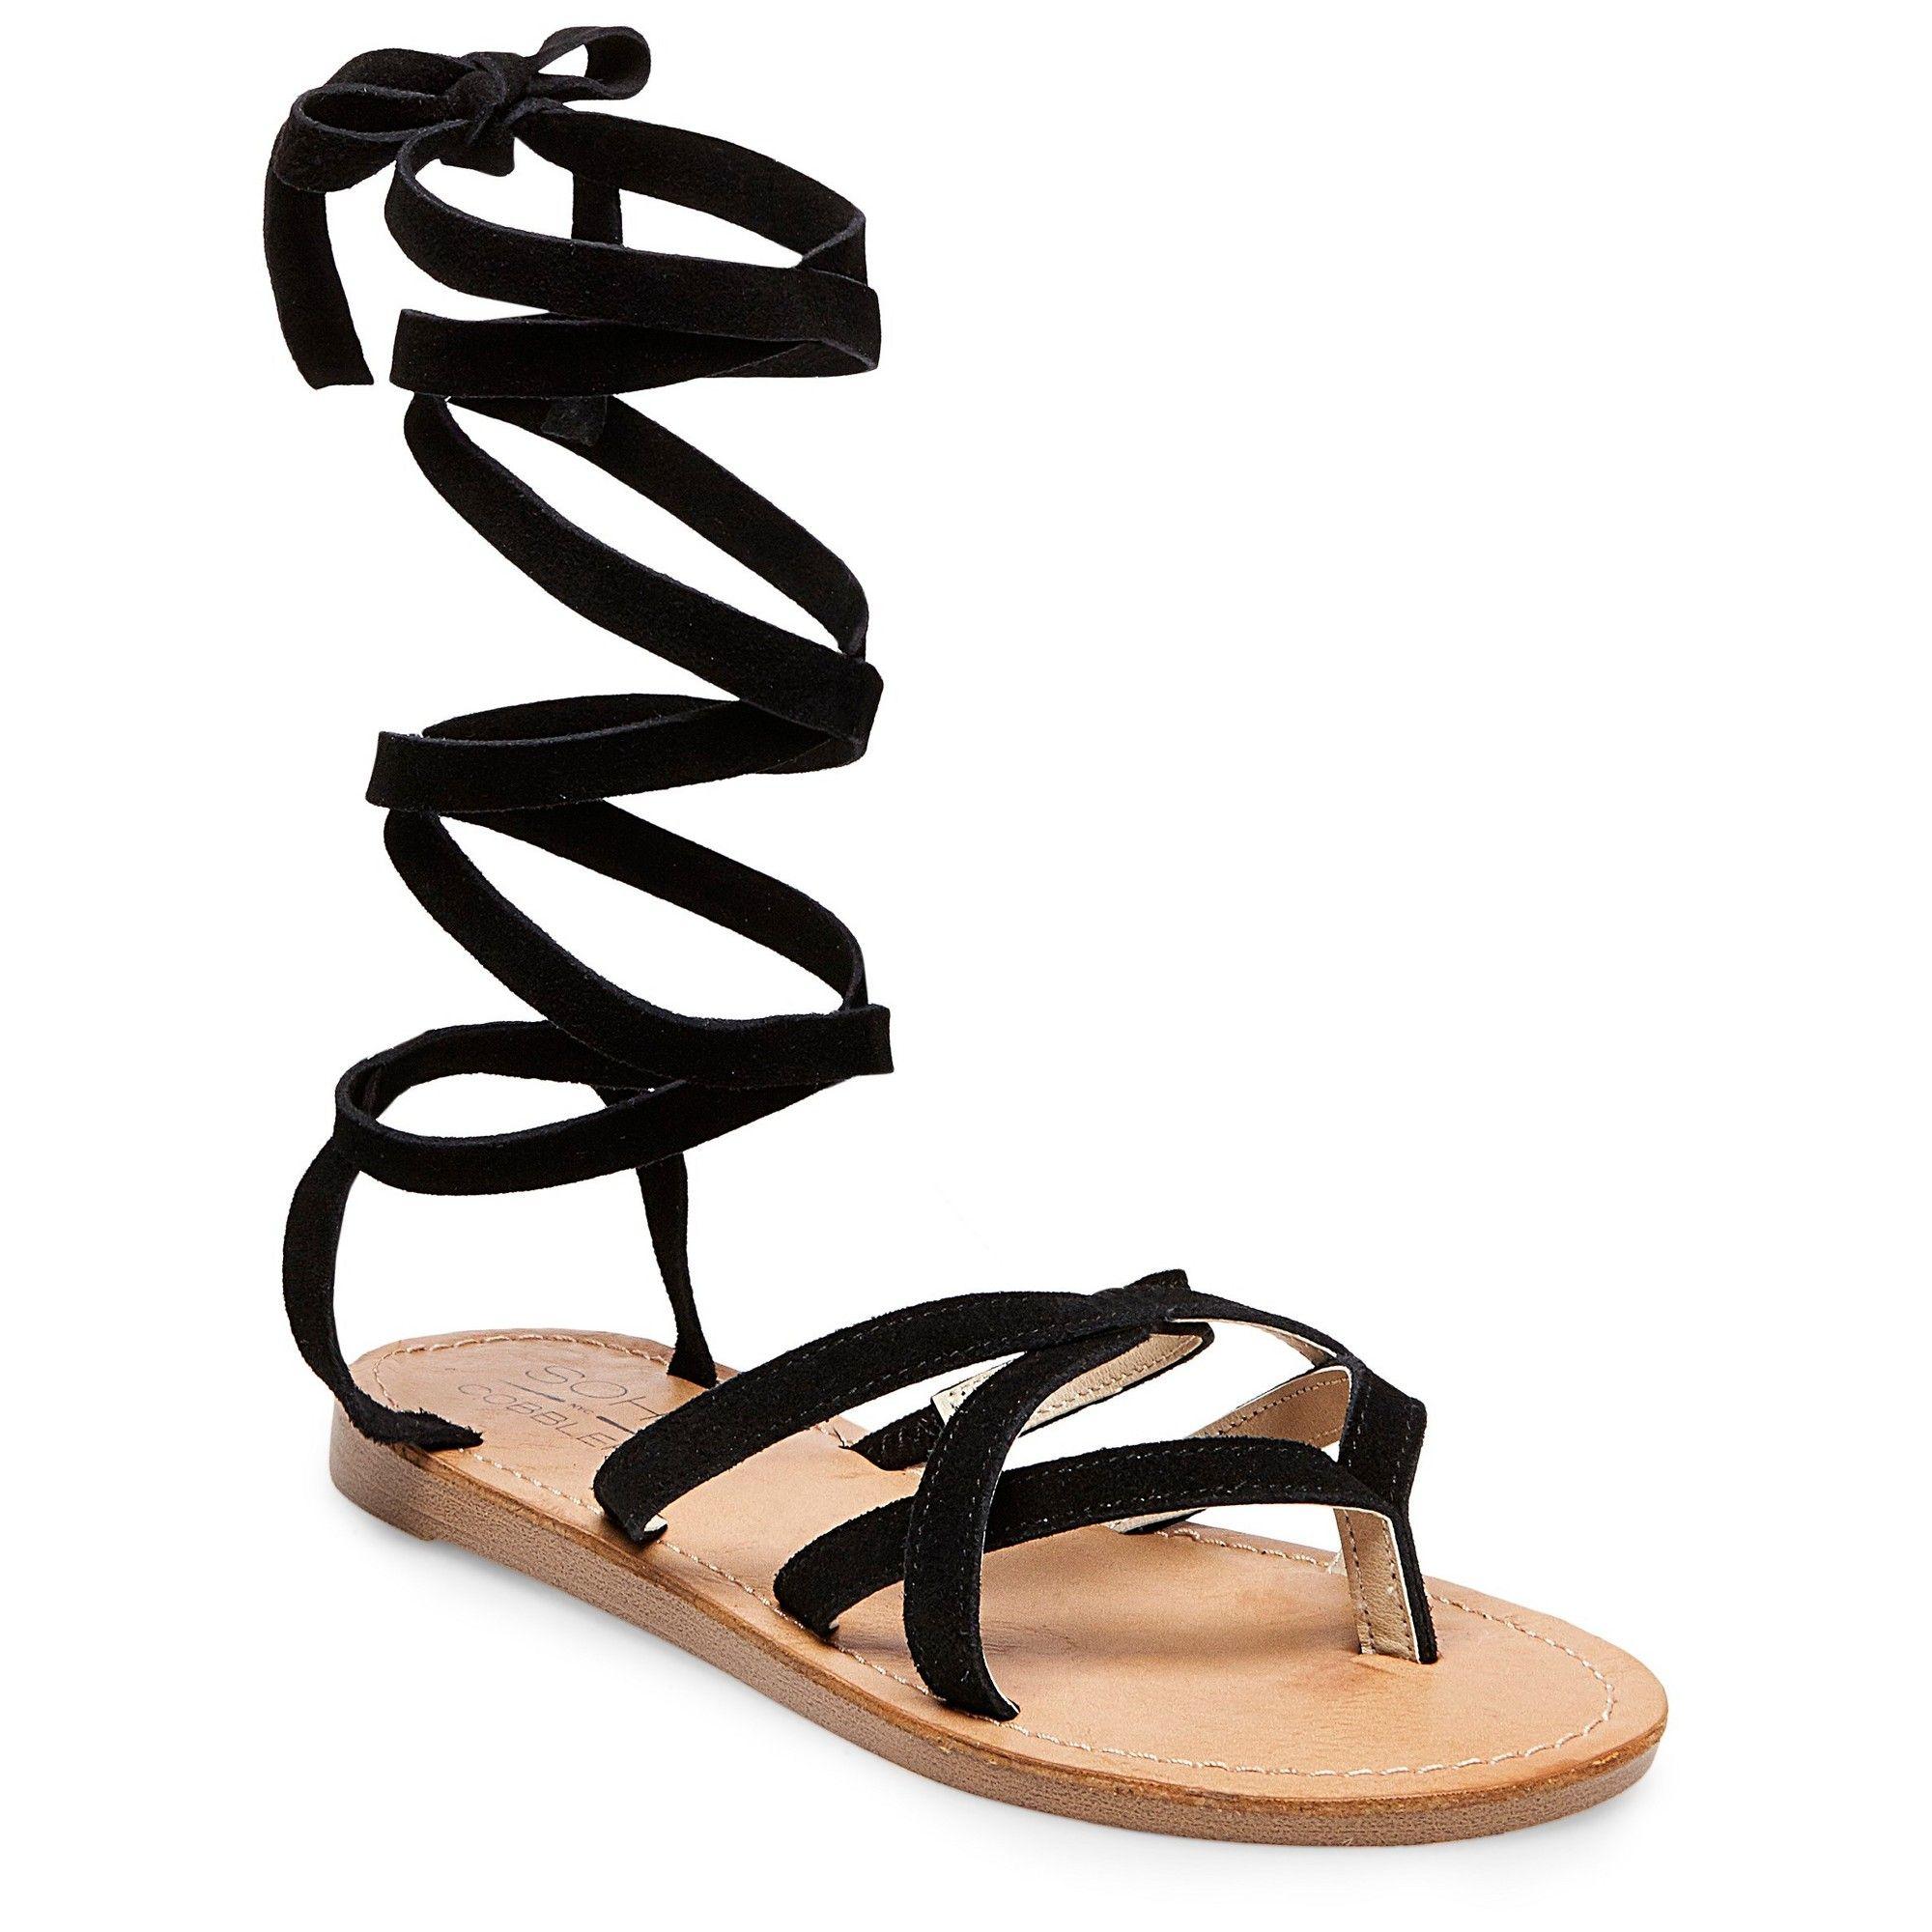 9b4eee49f1565 Women s Soho Cobbler Amathist Suede Ankle Wrap Gladiator Sandals - Black 7.5